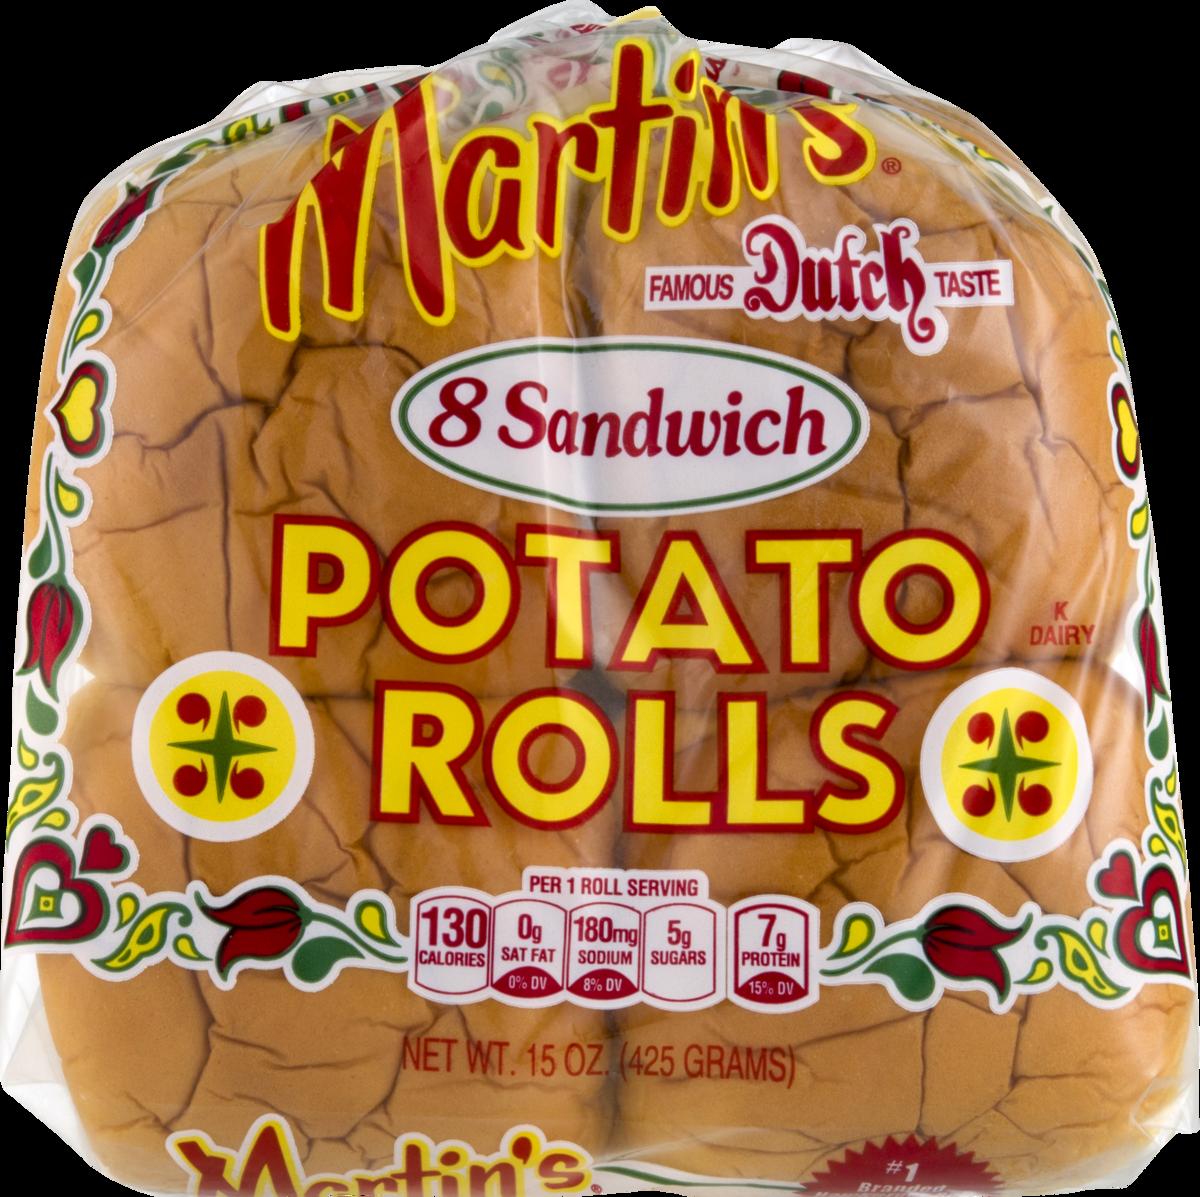 Martin's Potato Rolls 8 Sandwich Rolls (4 Bags)